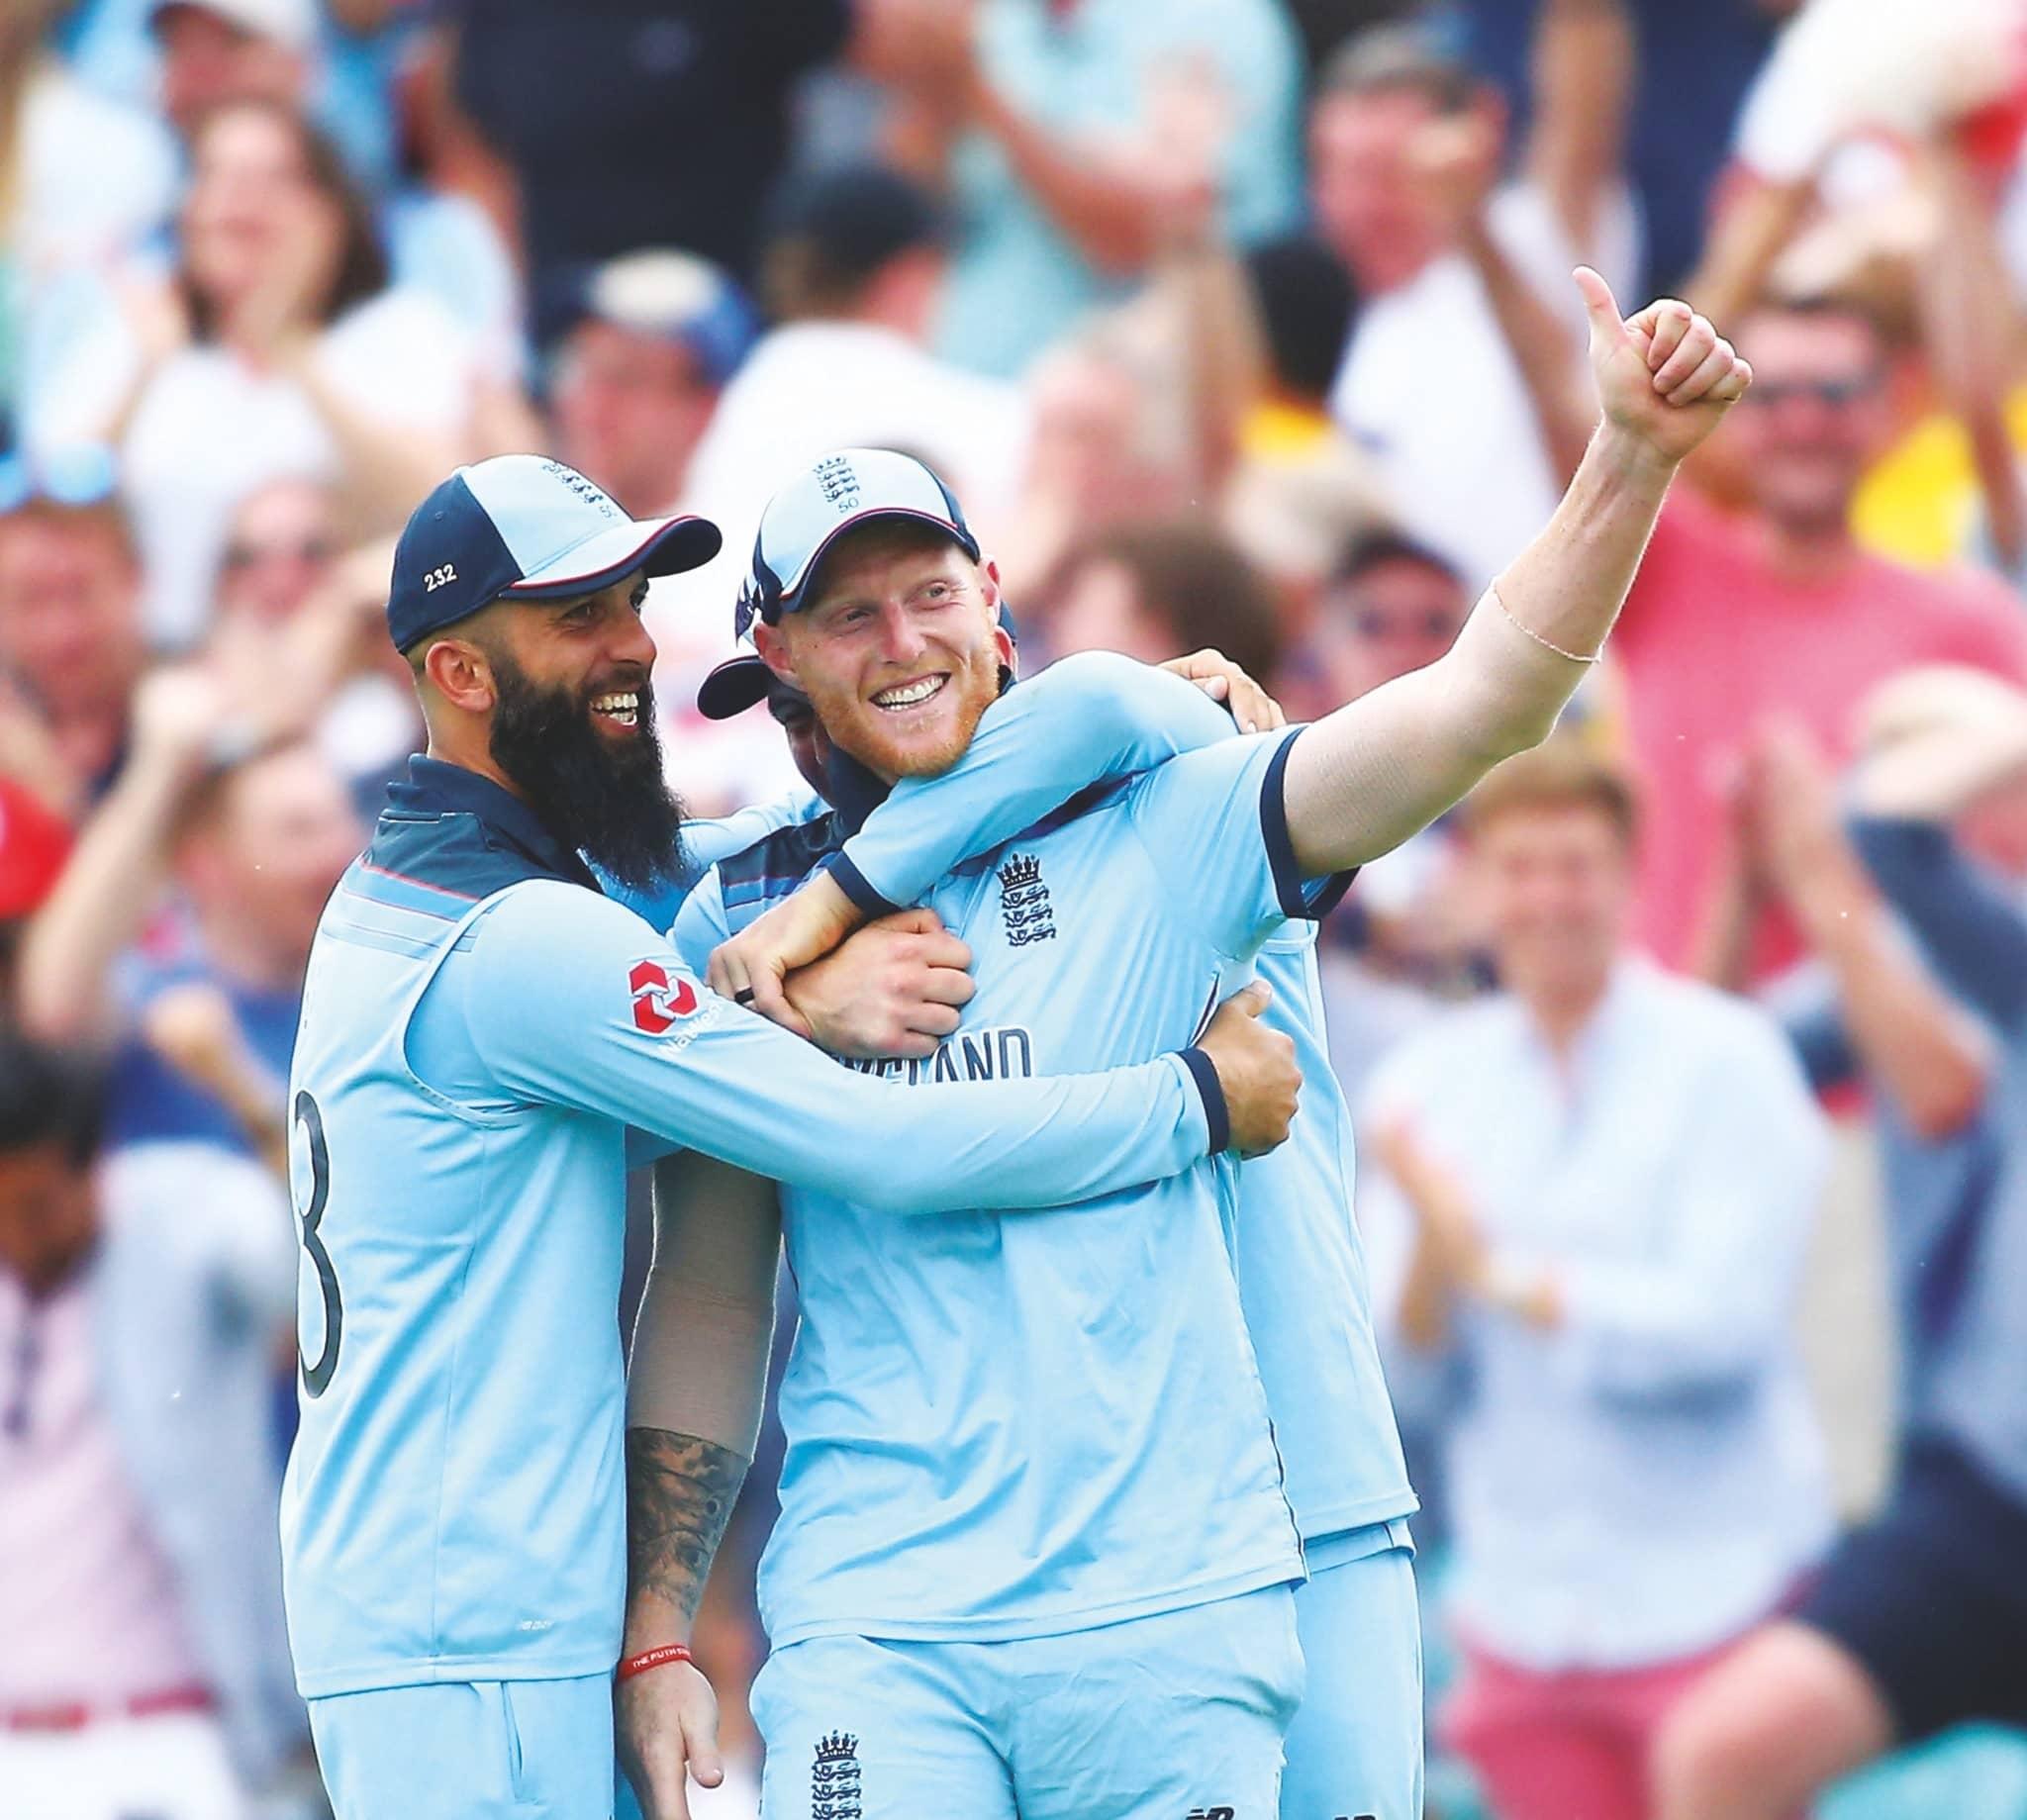 Superhero Stokes Inspires England